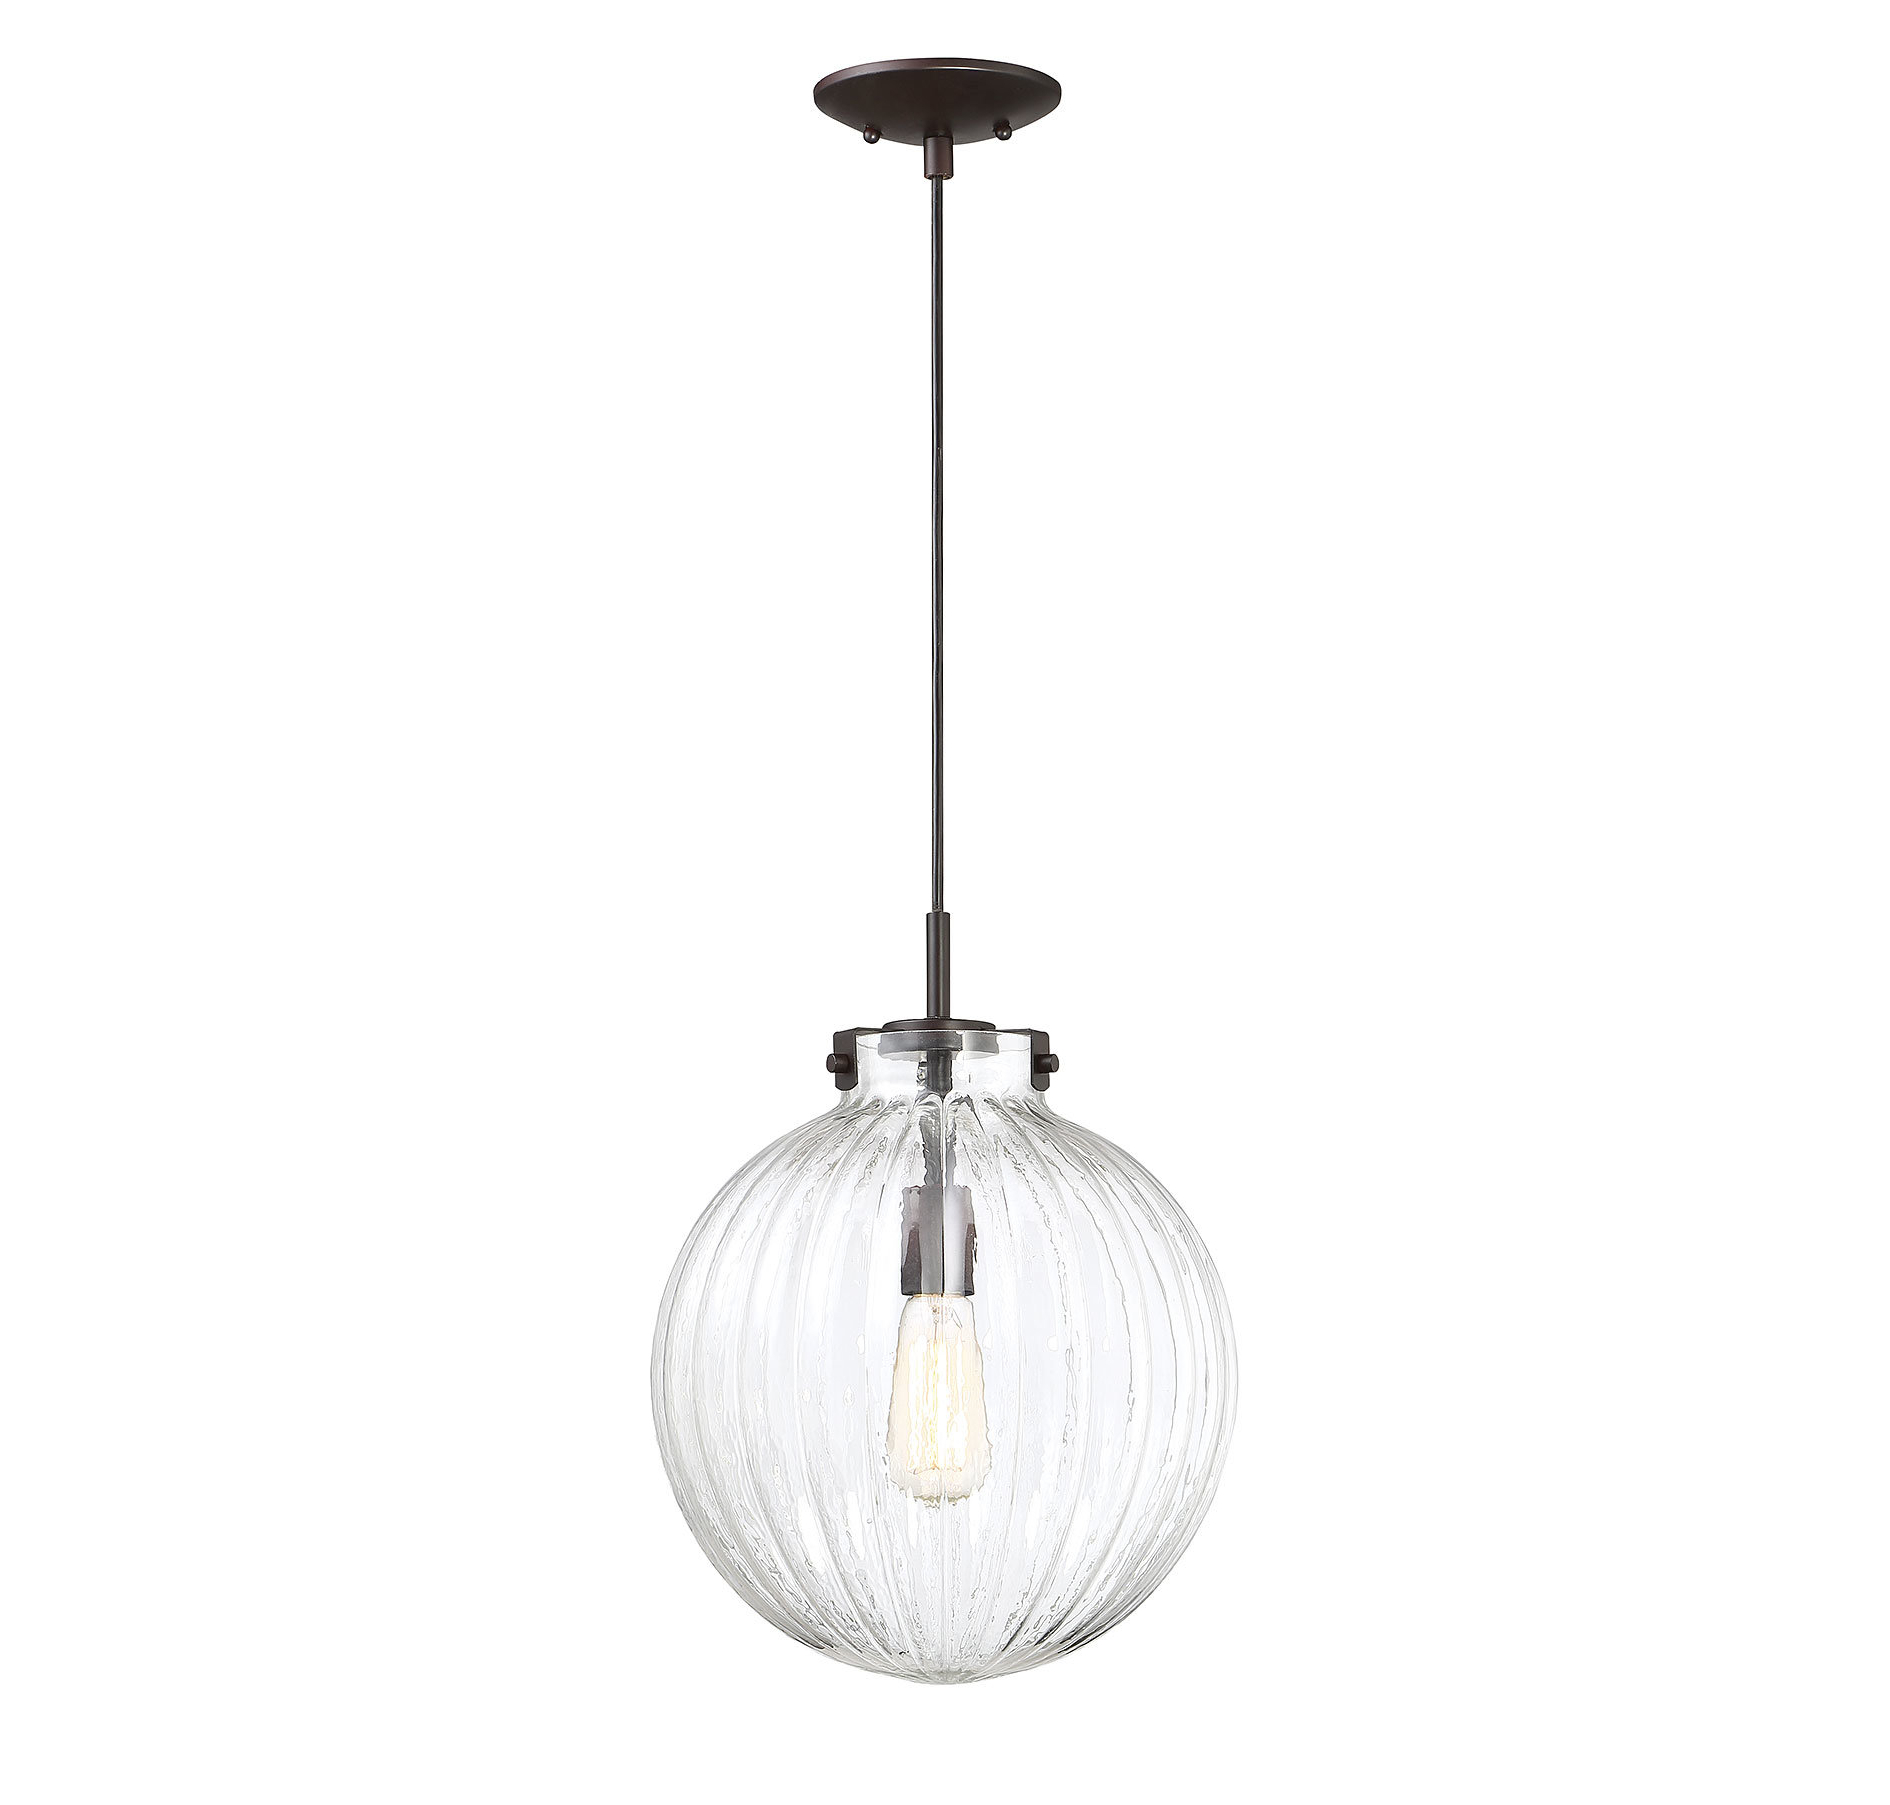 Latest Betsy 1 Light Single Globe Pendants Intended For Nevels 1 Light Single Globe Pendant (View 18 of 20)